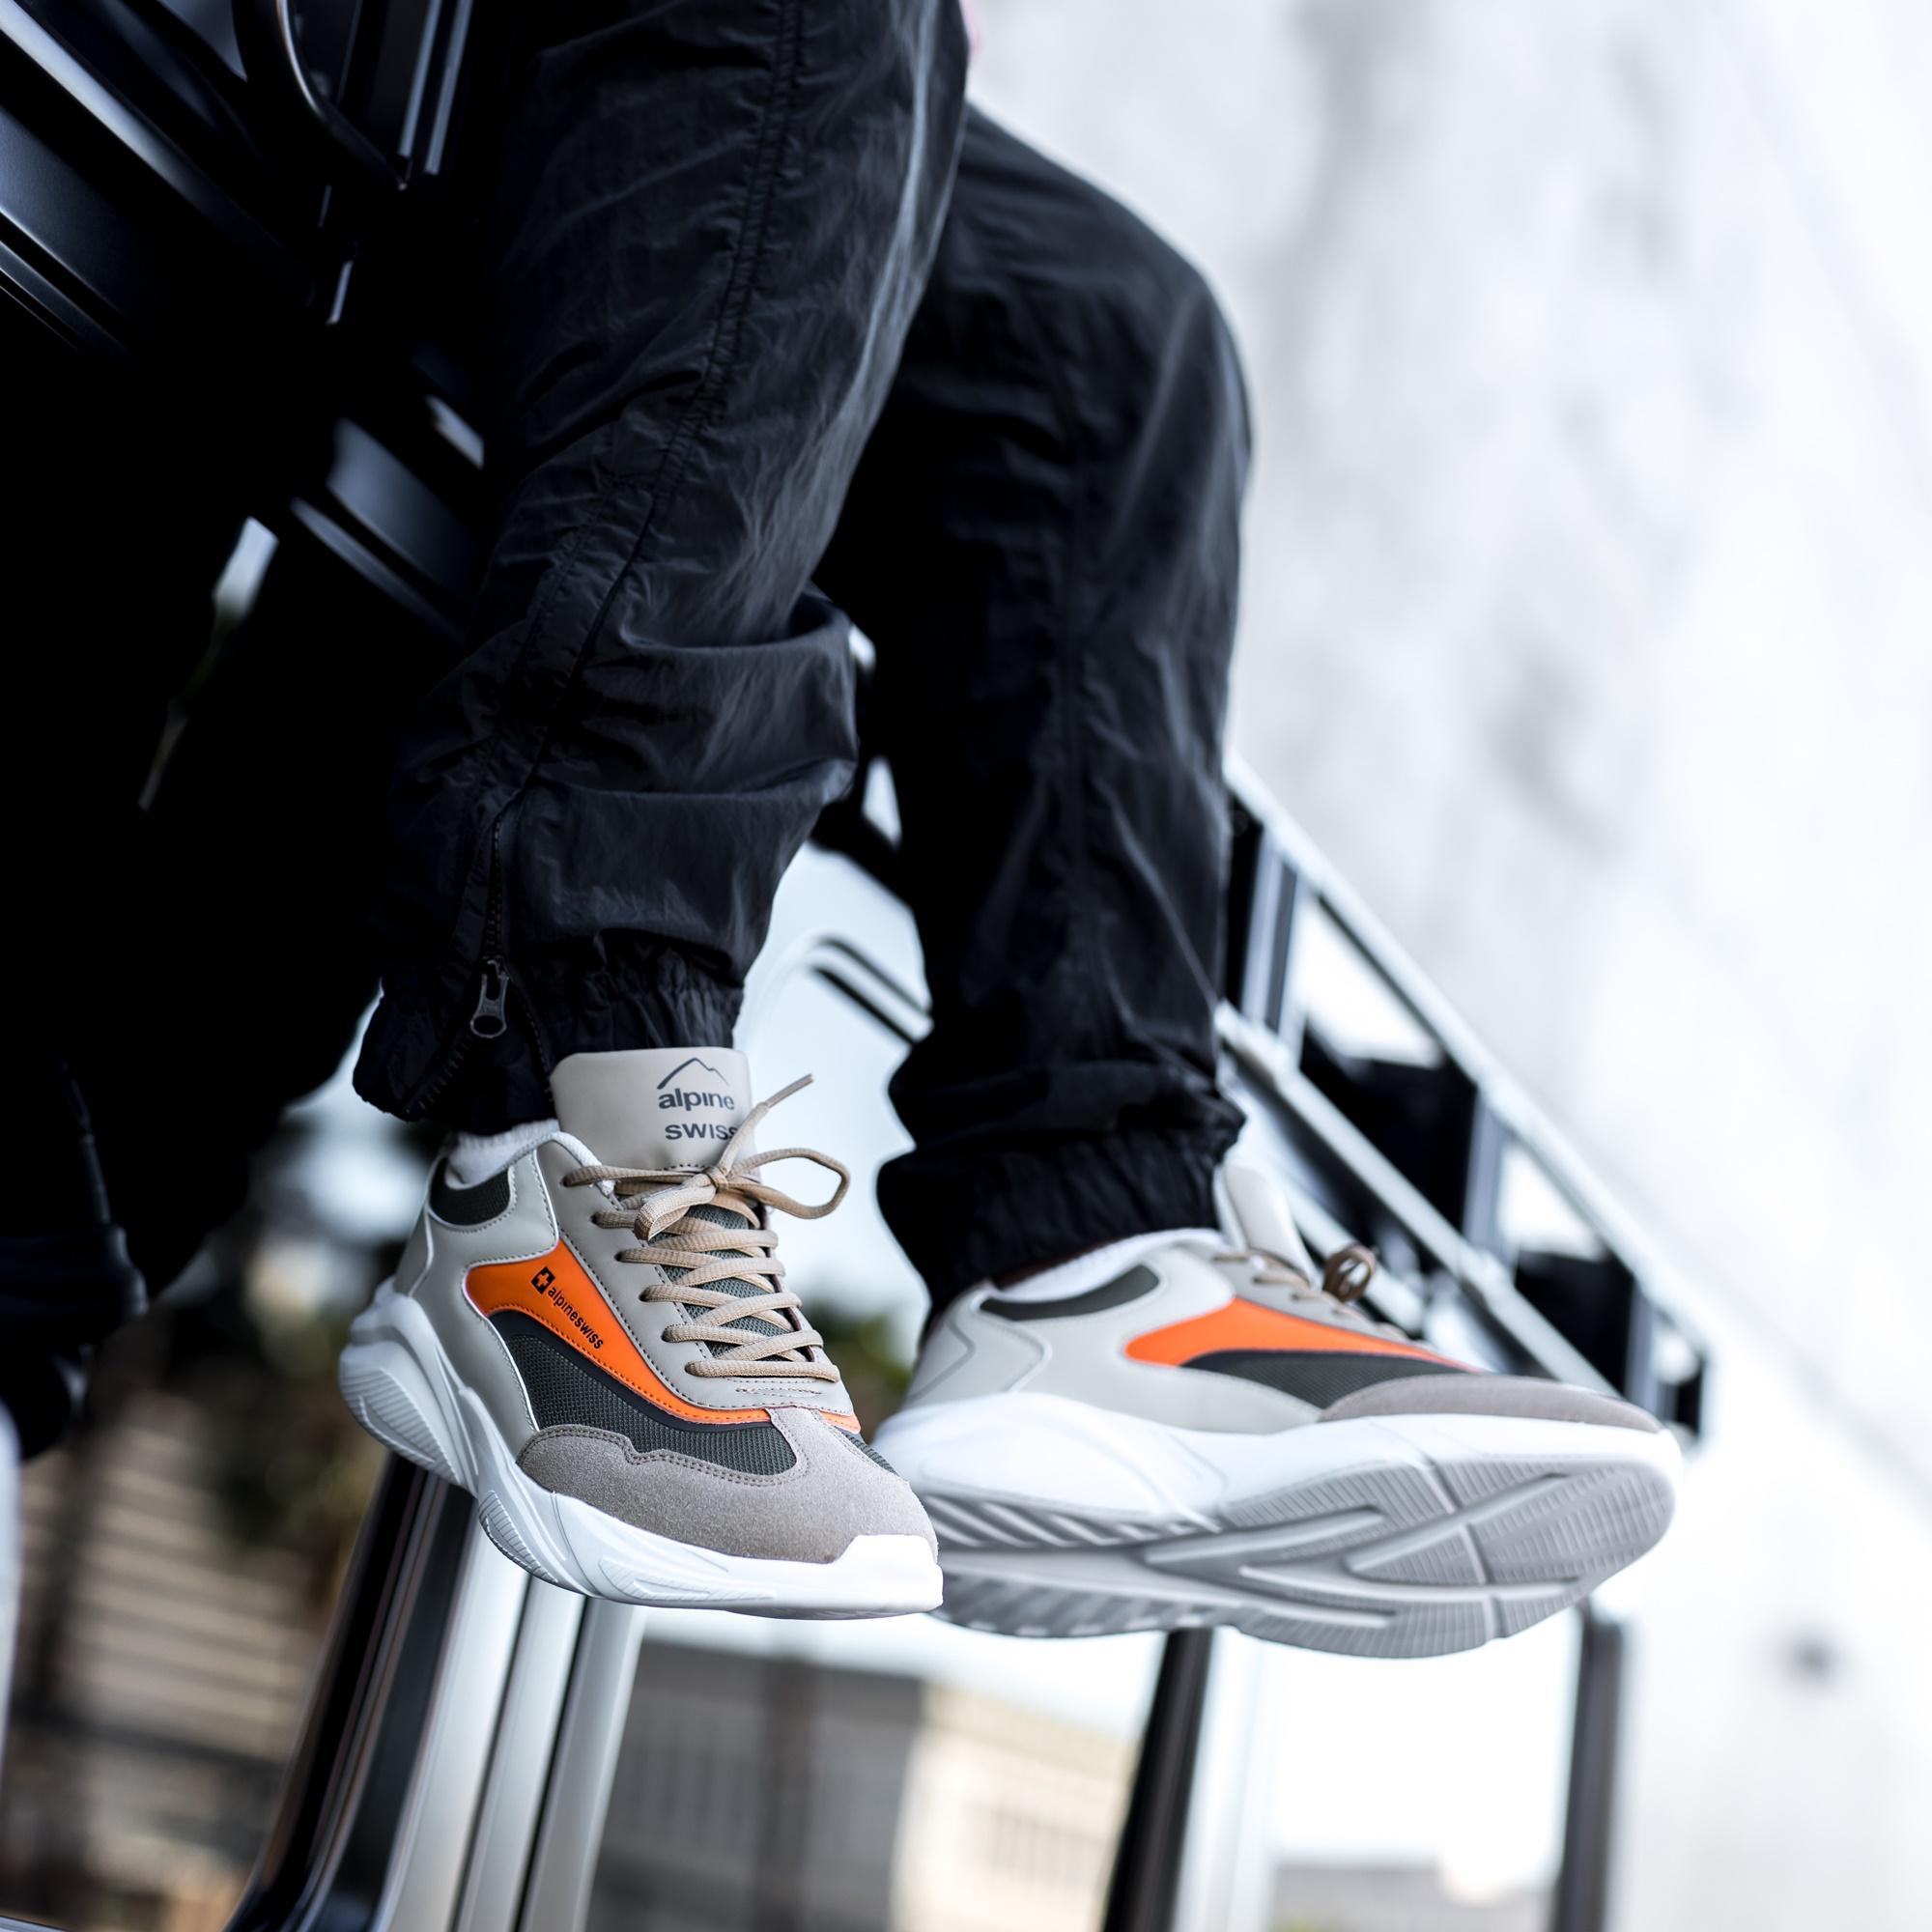 Alpine-Swiss-Stuart-Mens-Chunky-Sneakers-Retro-Platform-Dad-Tennis-Shoes thumbnail 31